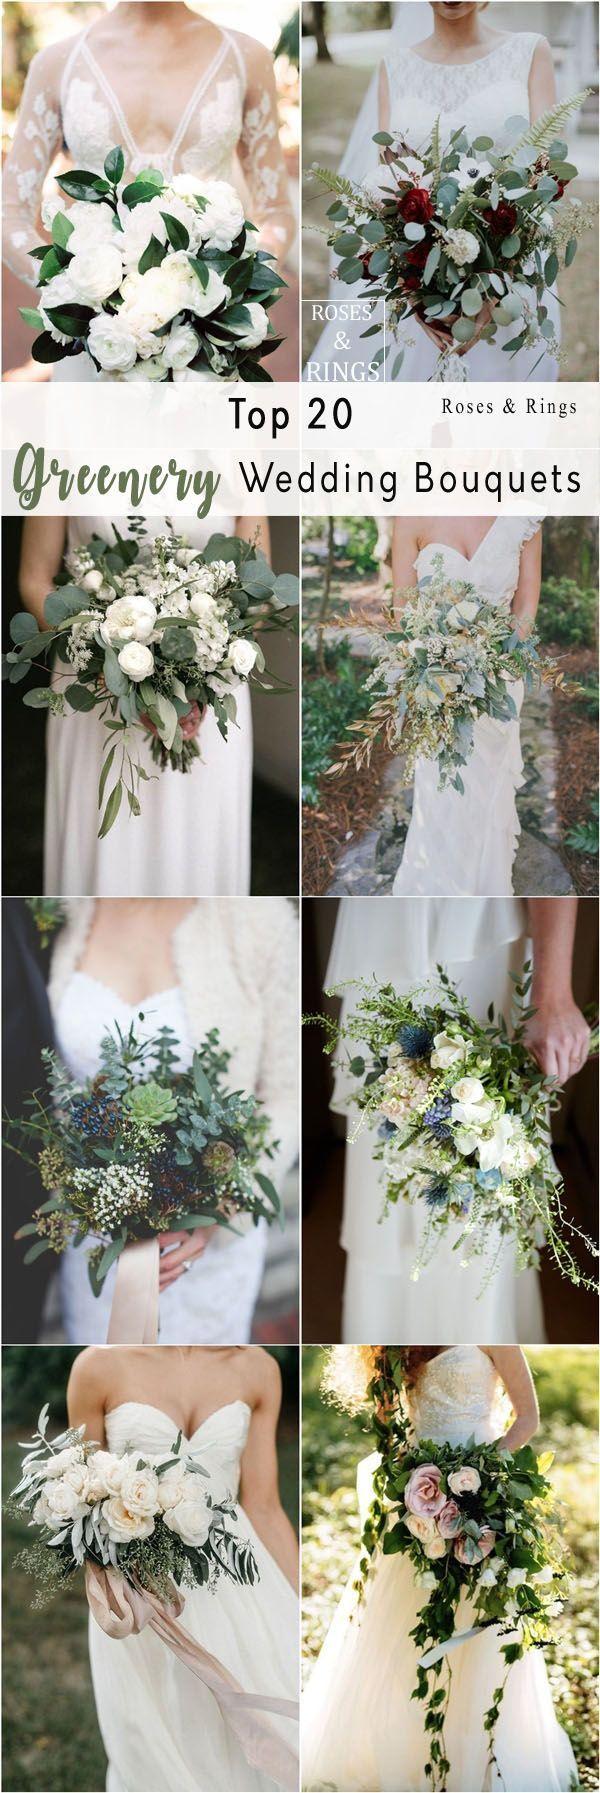 20 Best Greenery Wedding Bouquets #fantasticweddingbouquets